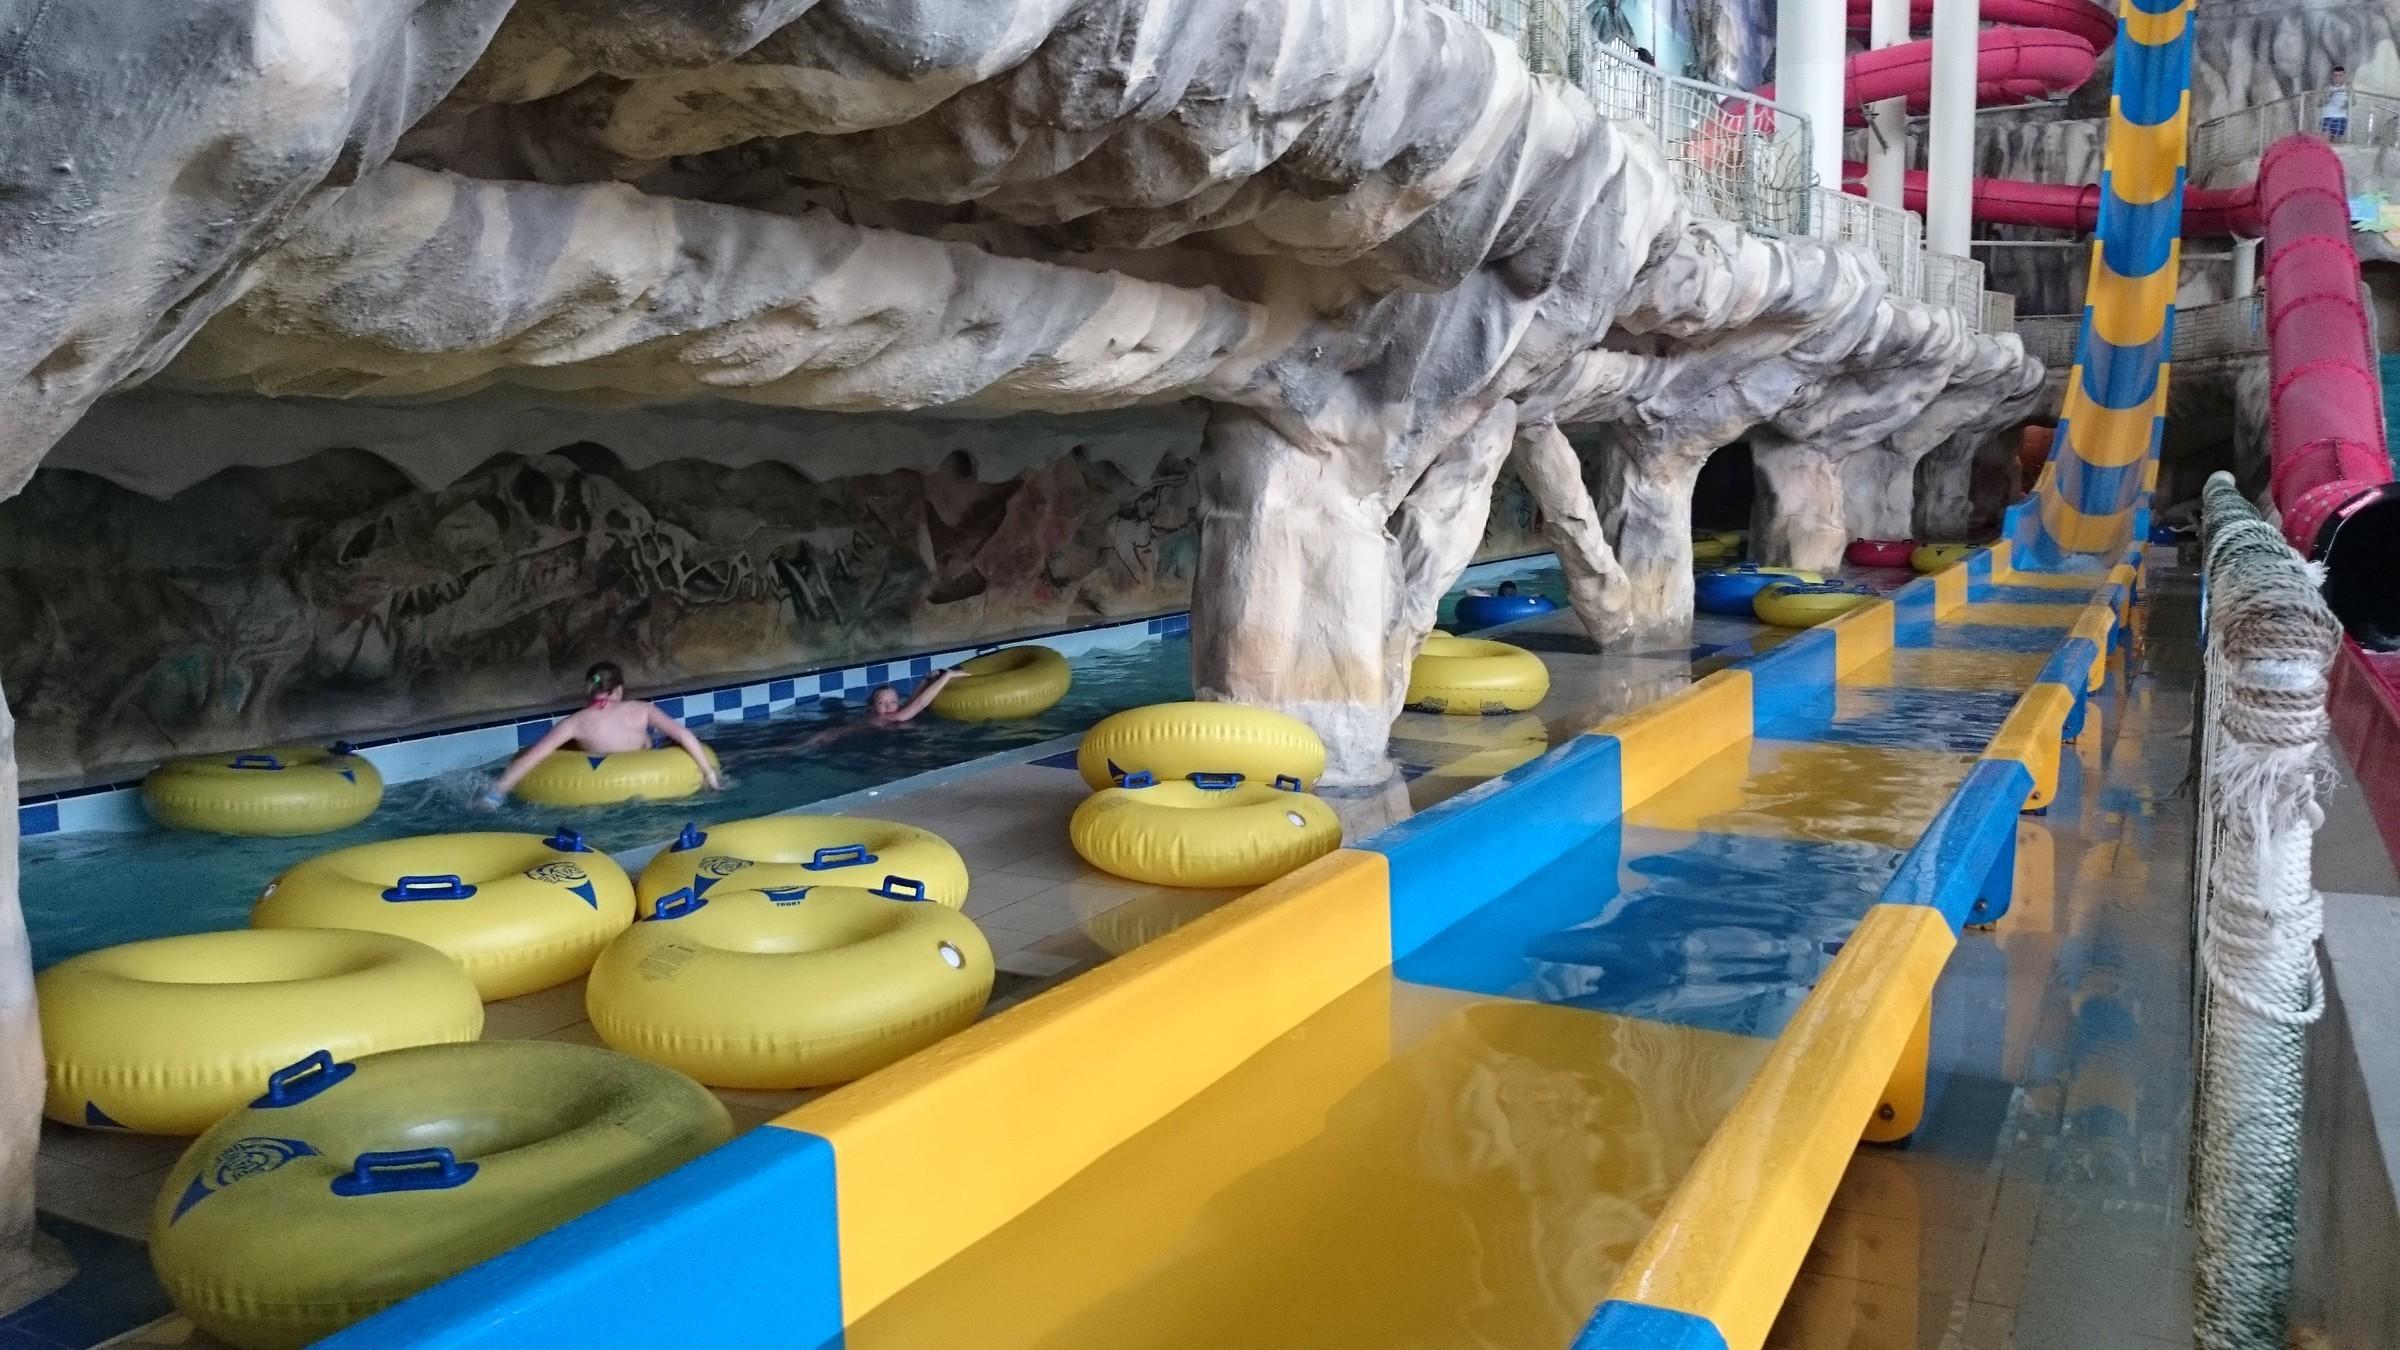 картинки аквапарка лимпопо в екатеринбурге том, как